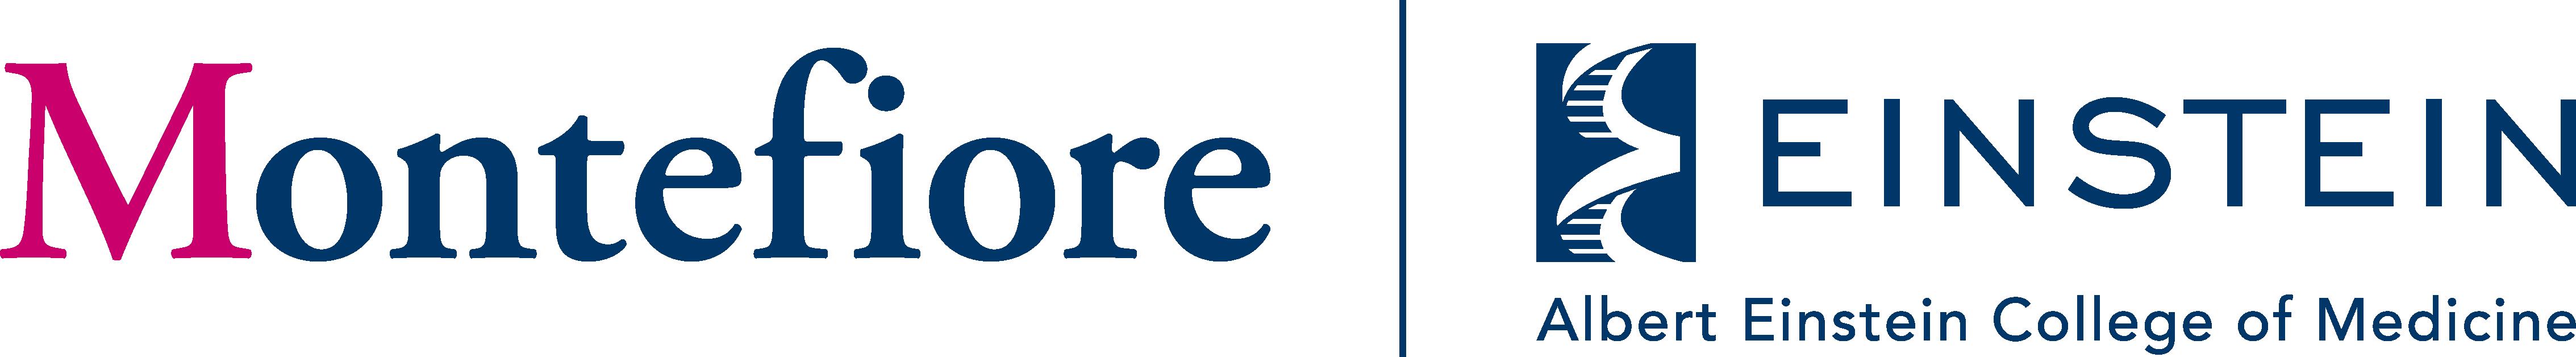 Partner | Cancer Centers | <b>Montefiore Einstein Center for Cancer Care</b>